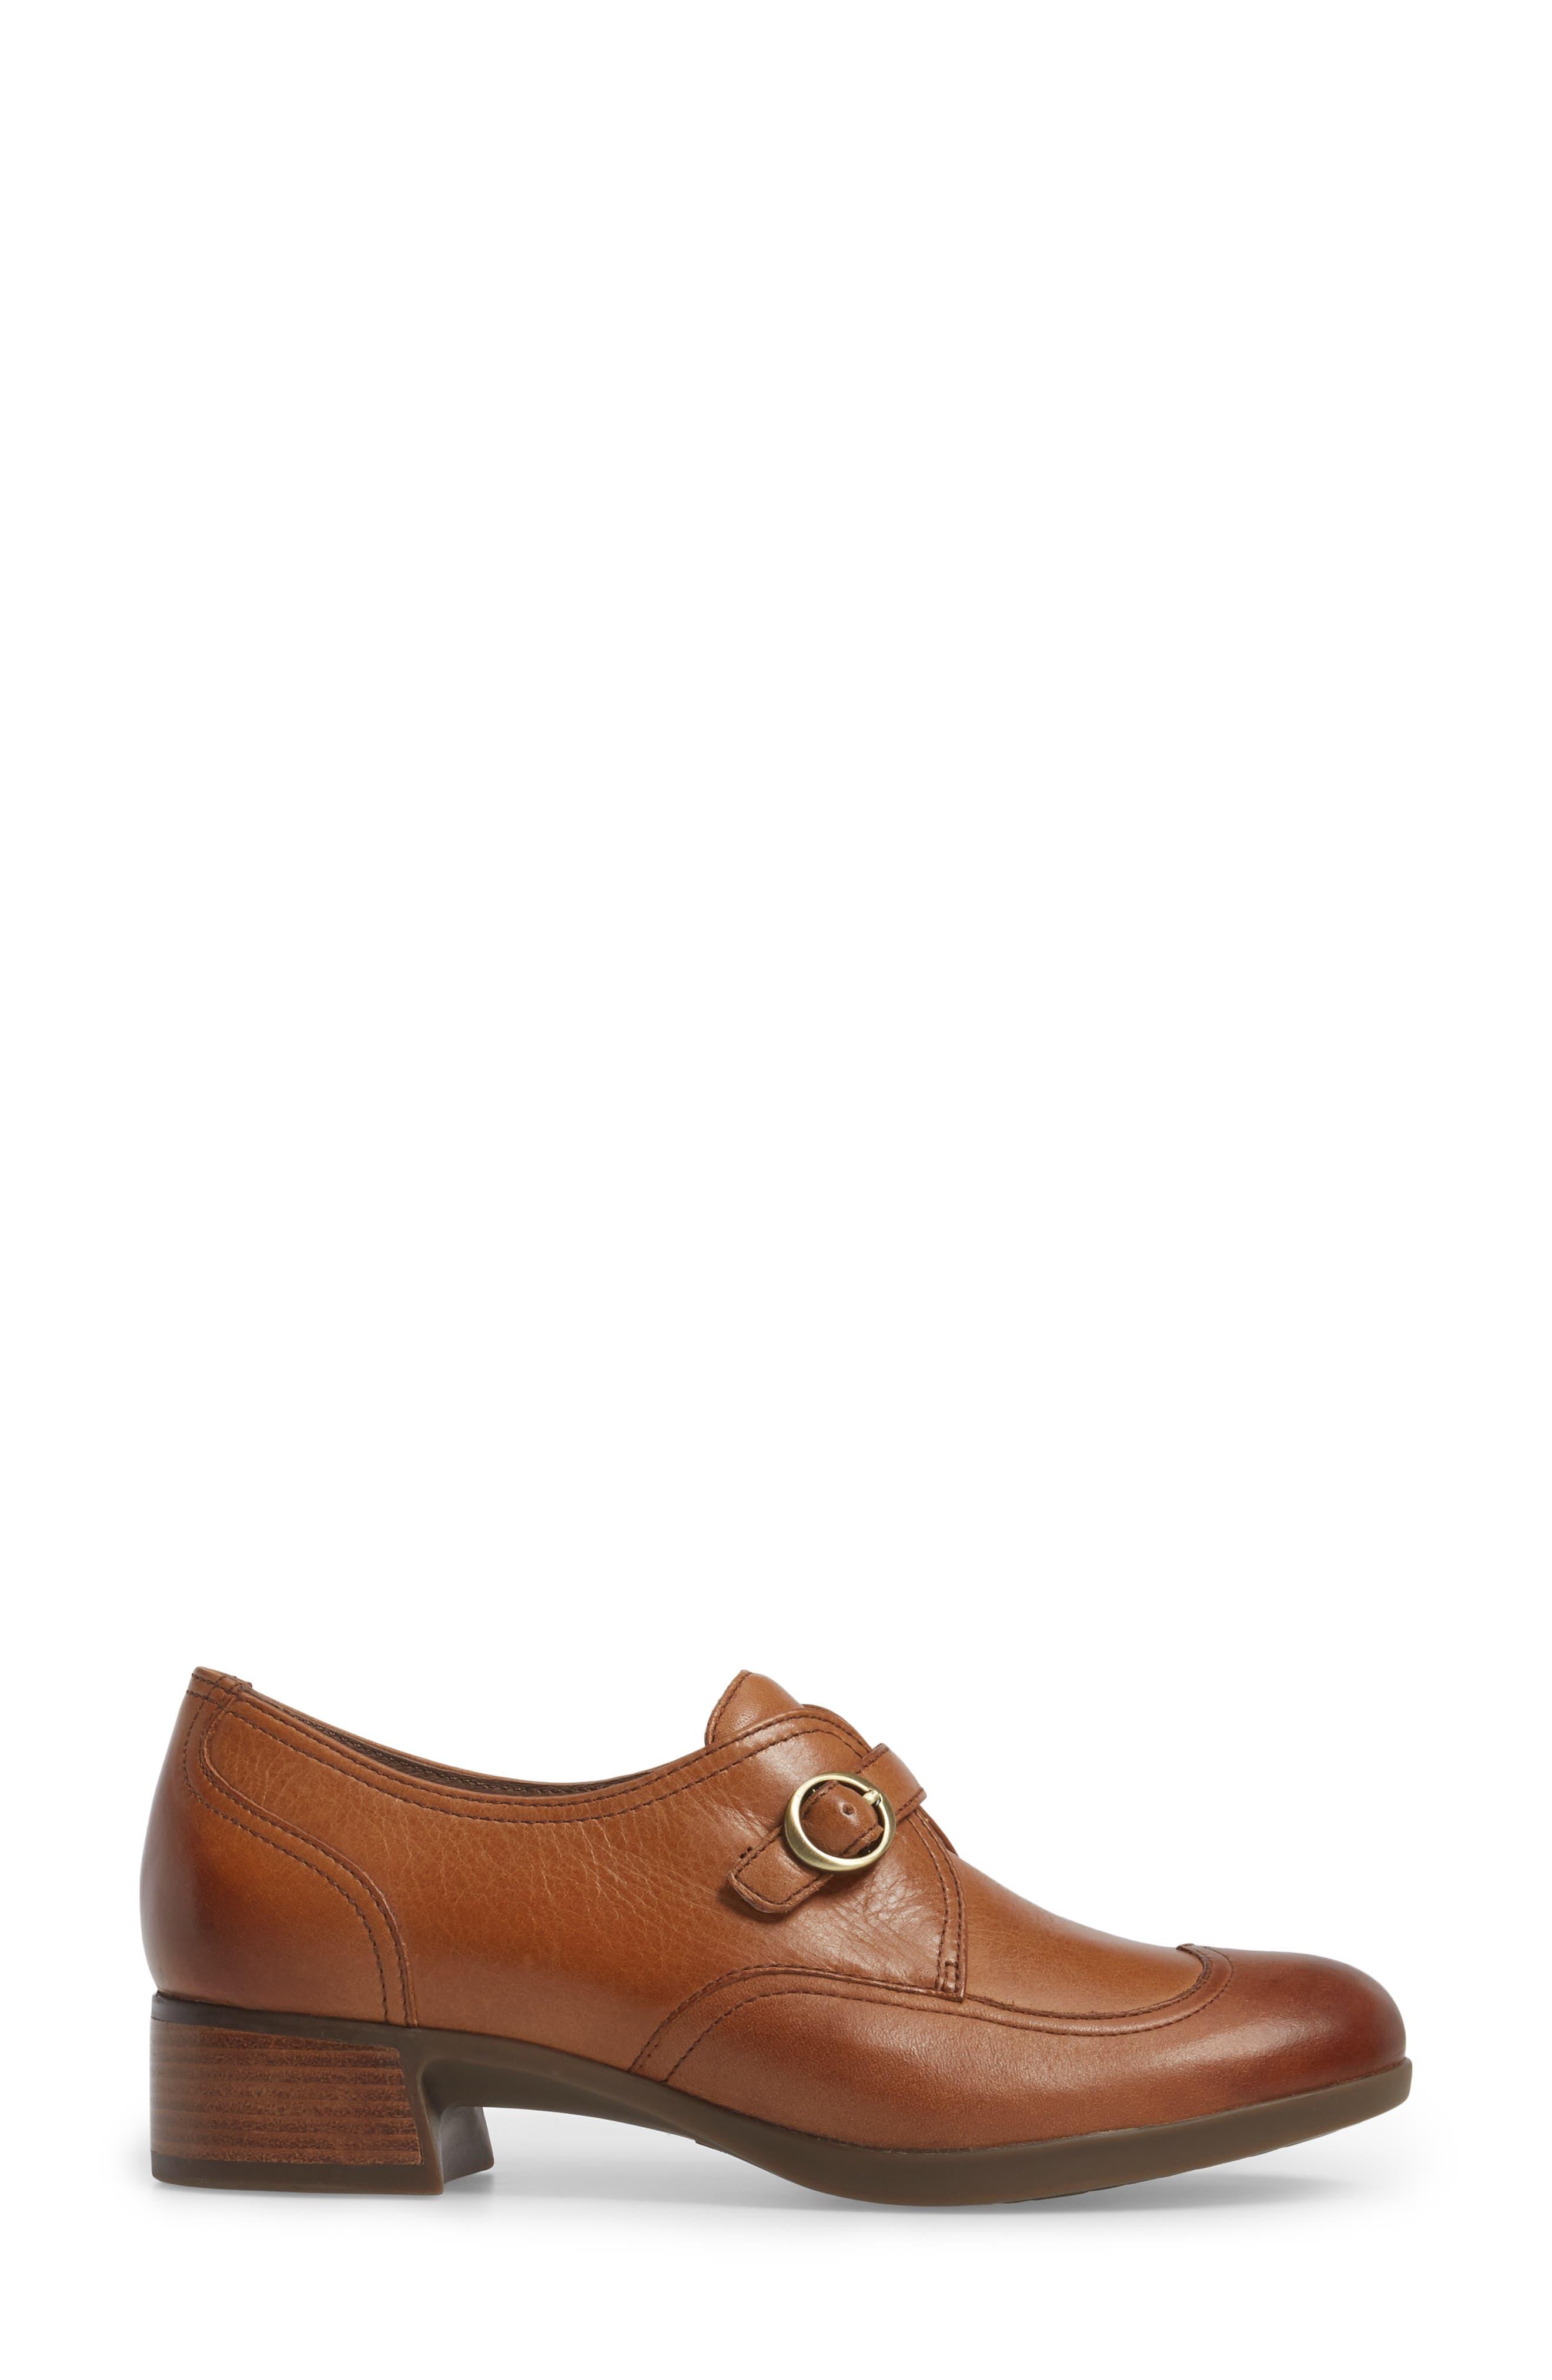 Livie Wingtip Oxford,                             Alternate thumbnail 3, color,                             Saddle Burnished Nappa Leather